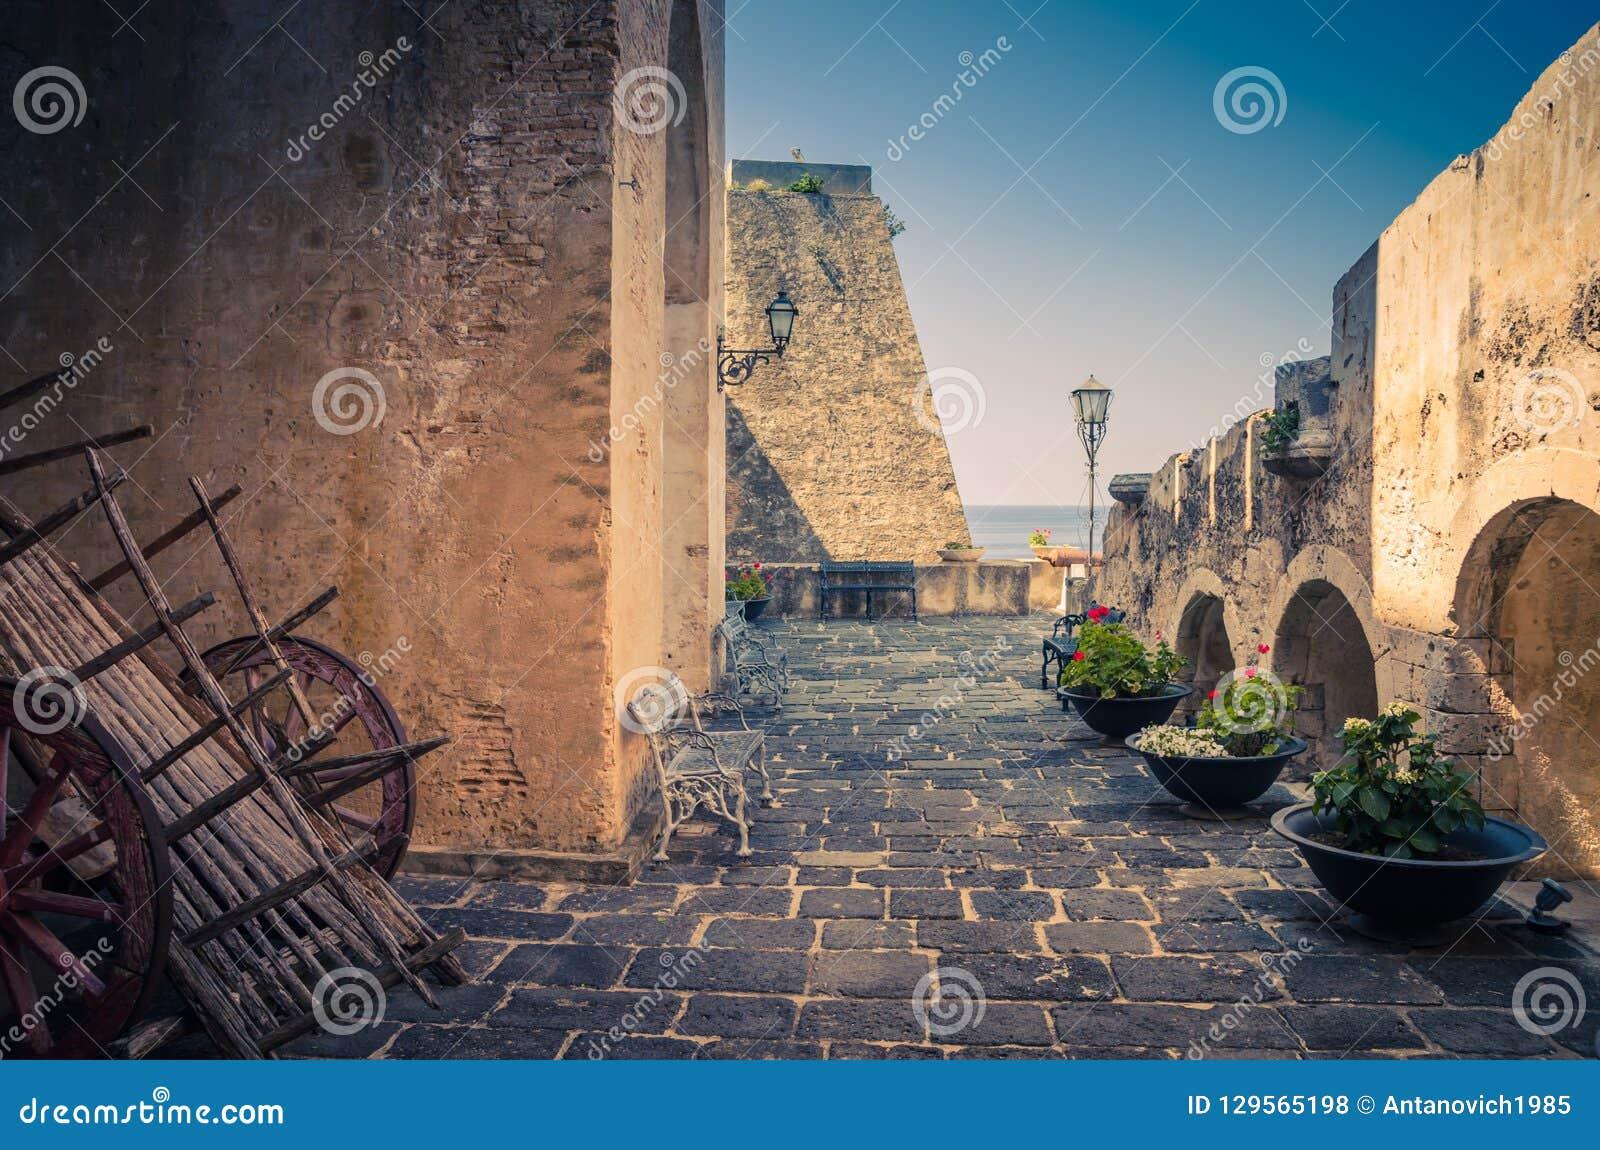 Binnenplaats oud middeleeuws kasteel Castello Ruffo, Scilla, Italië